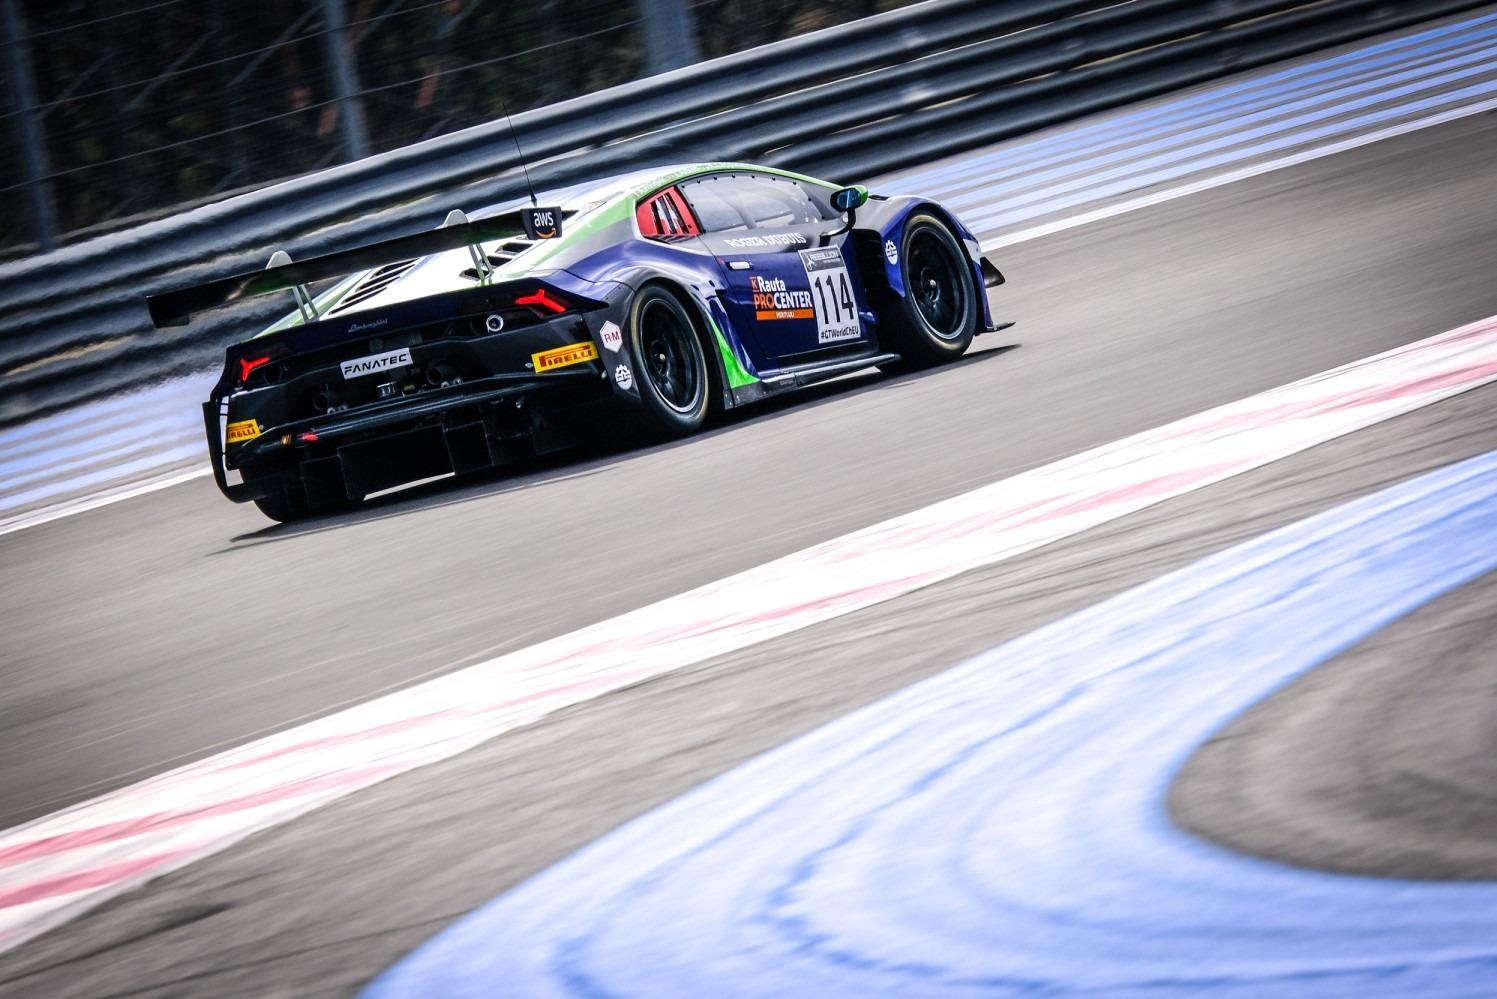 Williams F1 reserve Aitken making GT change to broaden skillset - Motor Informed